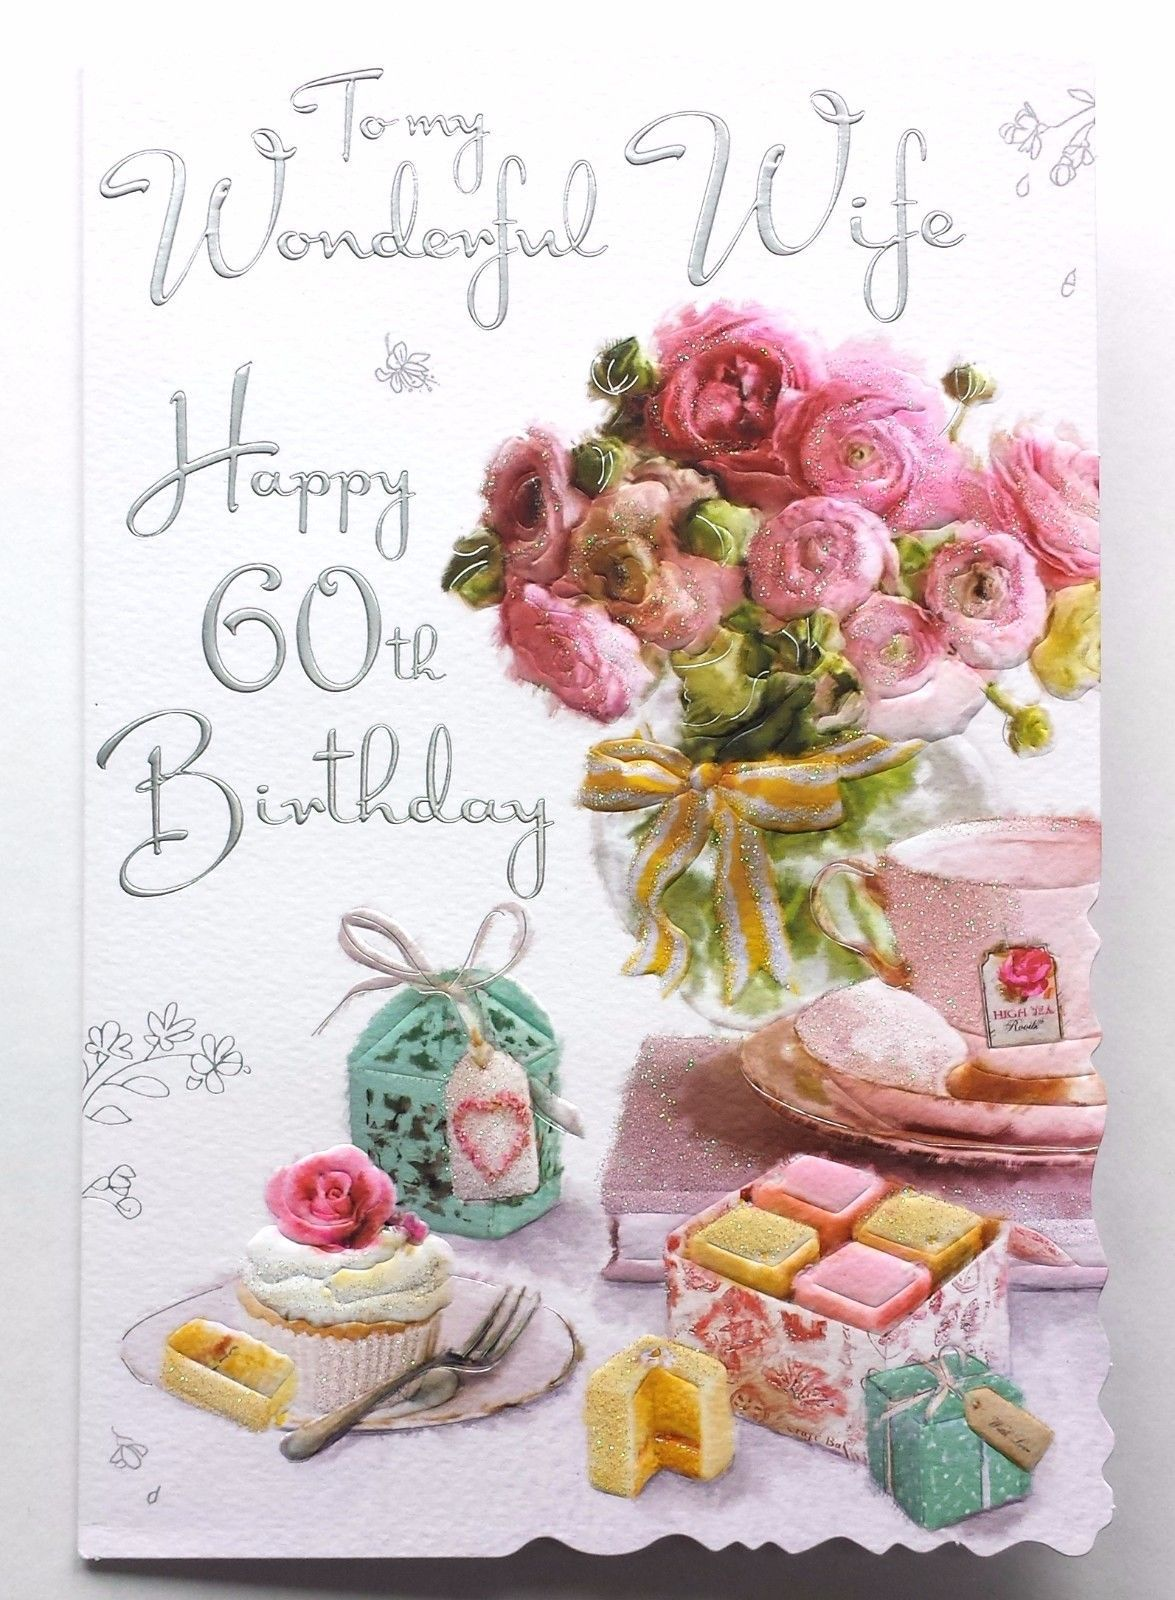 To My Wonderful Wife Happy 60th Birthday Beautiful 60 Birthday Card Lovely Words 60th Birthday Cards 60th Birthday Happy 60th Birthday